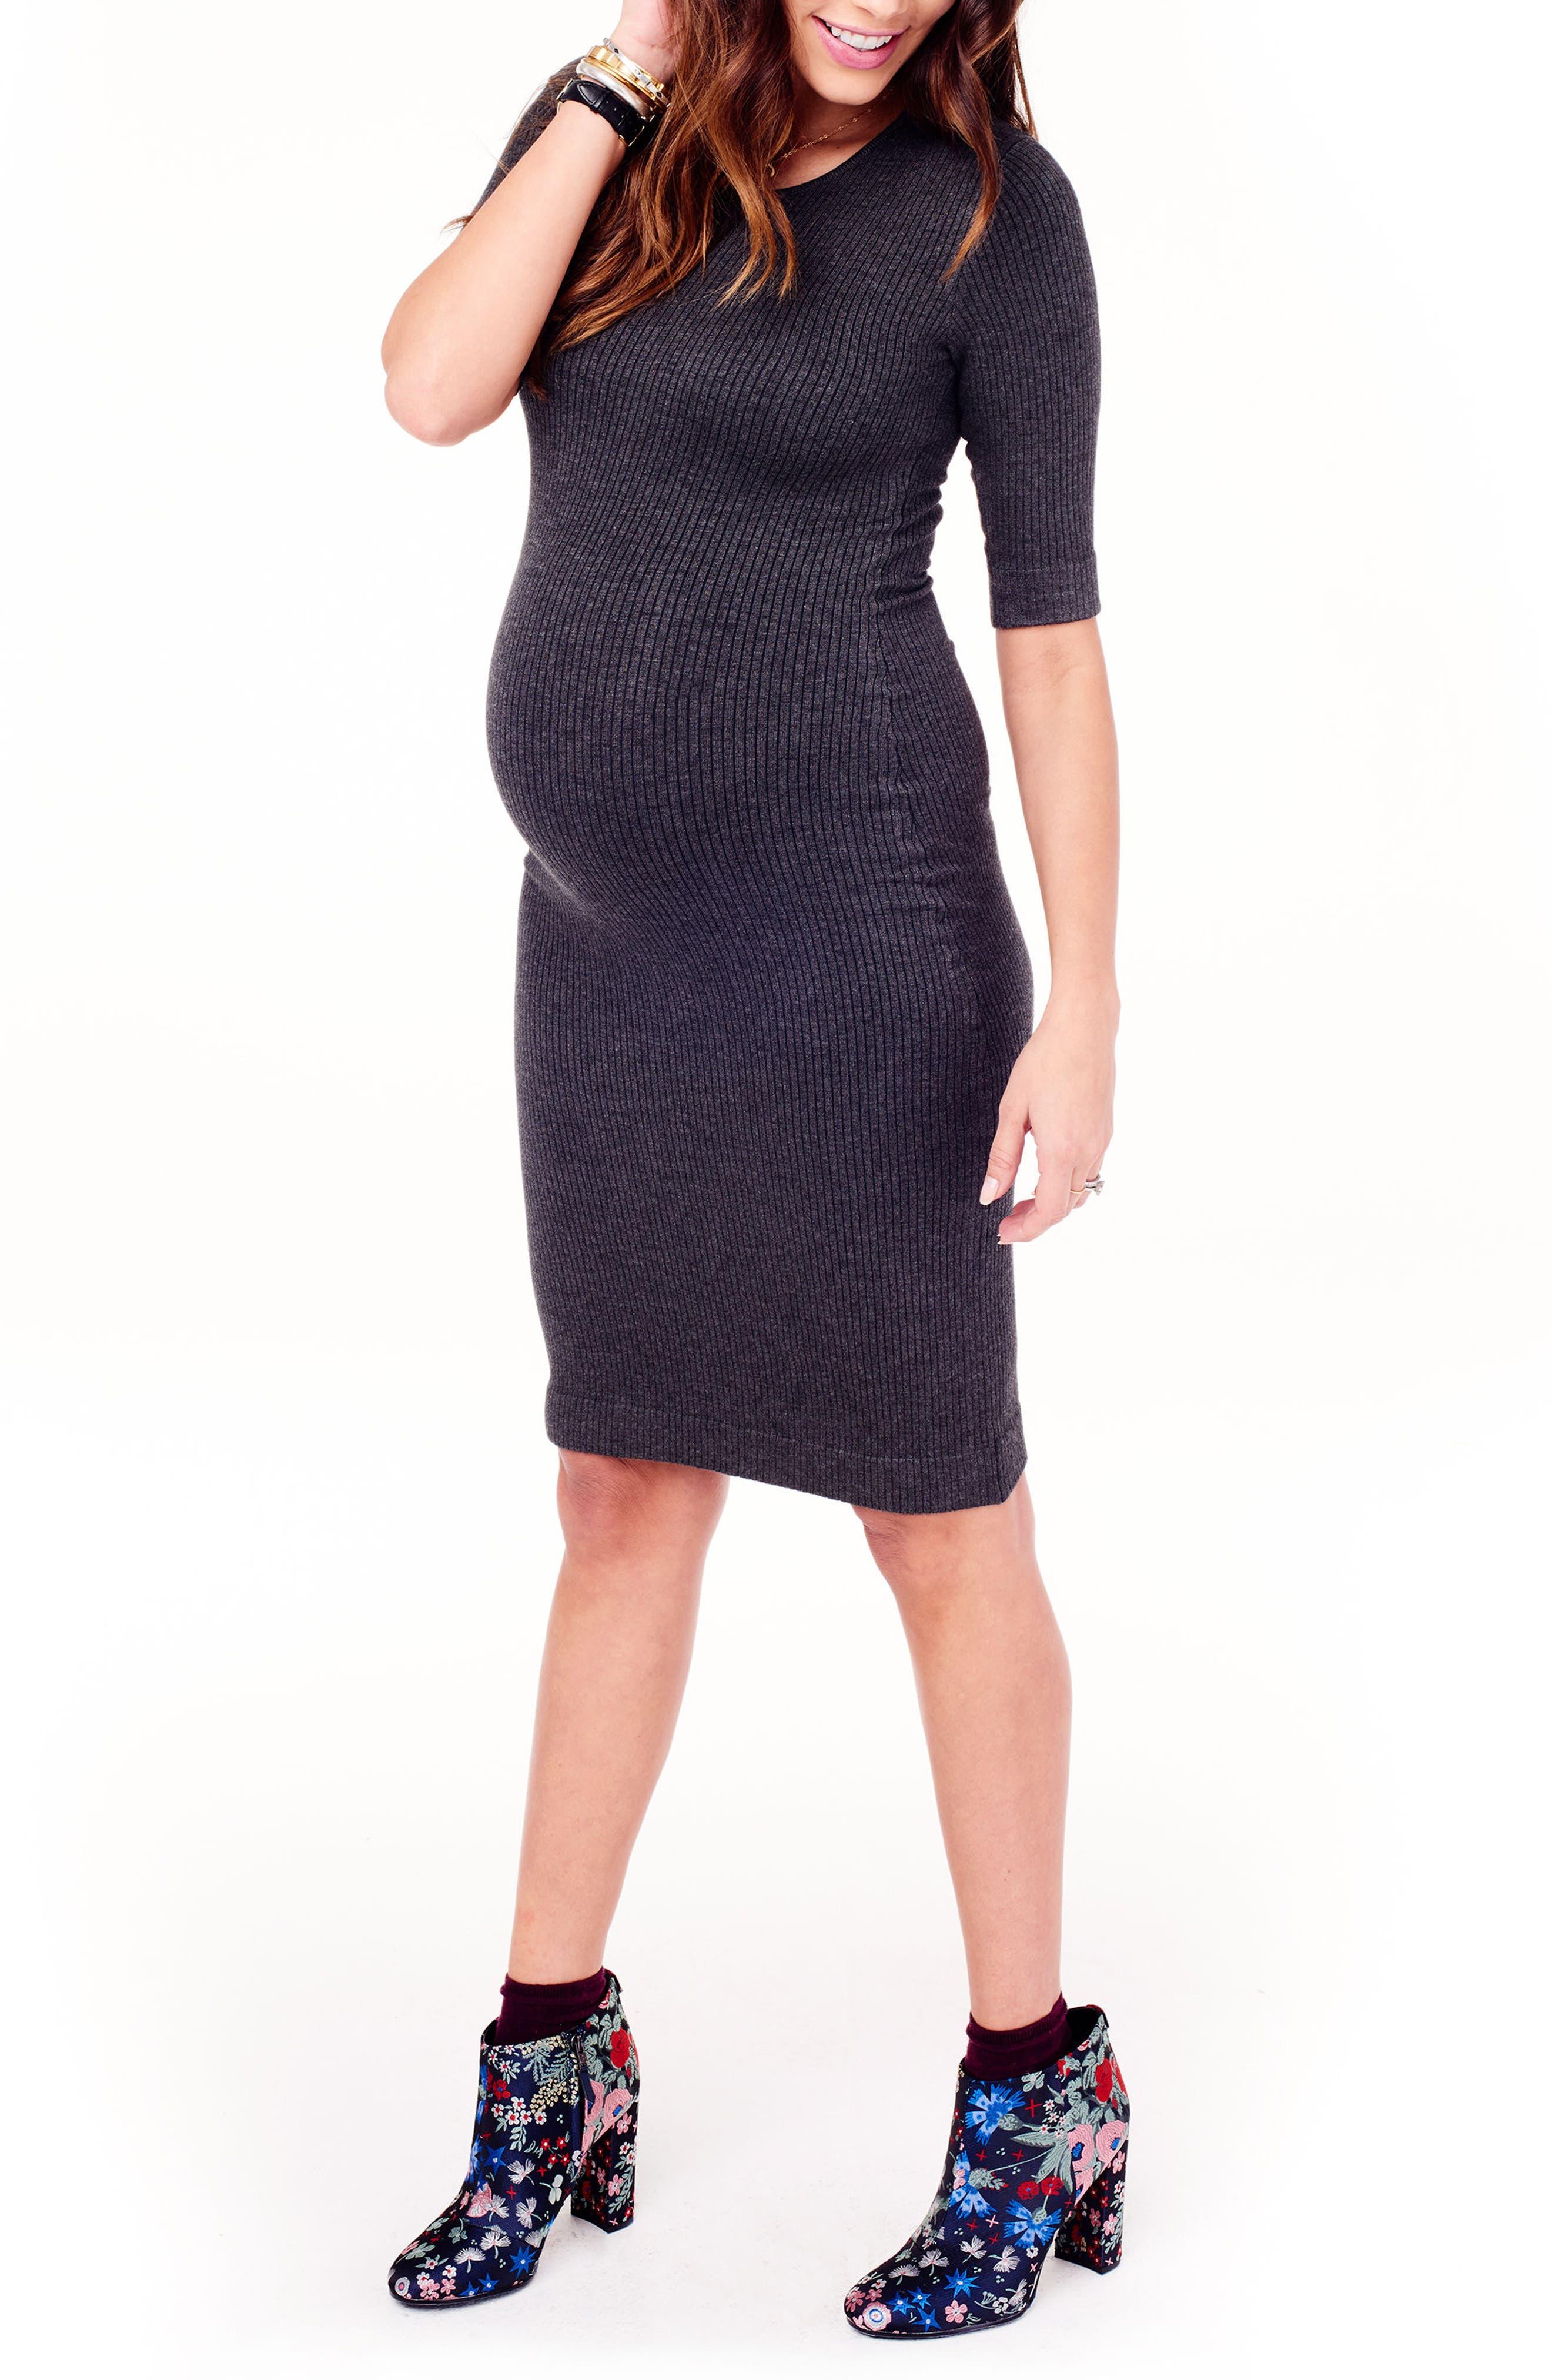 Ribbed Maternity Sweater Dress,                             Alternate thumbnail 3, color,                             MEDIUM GREY HEATHER